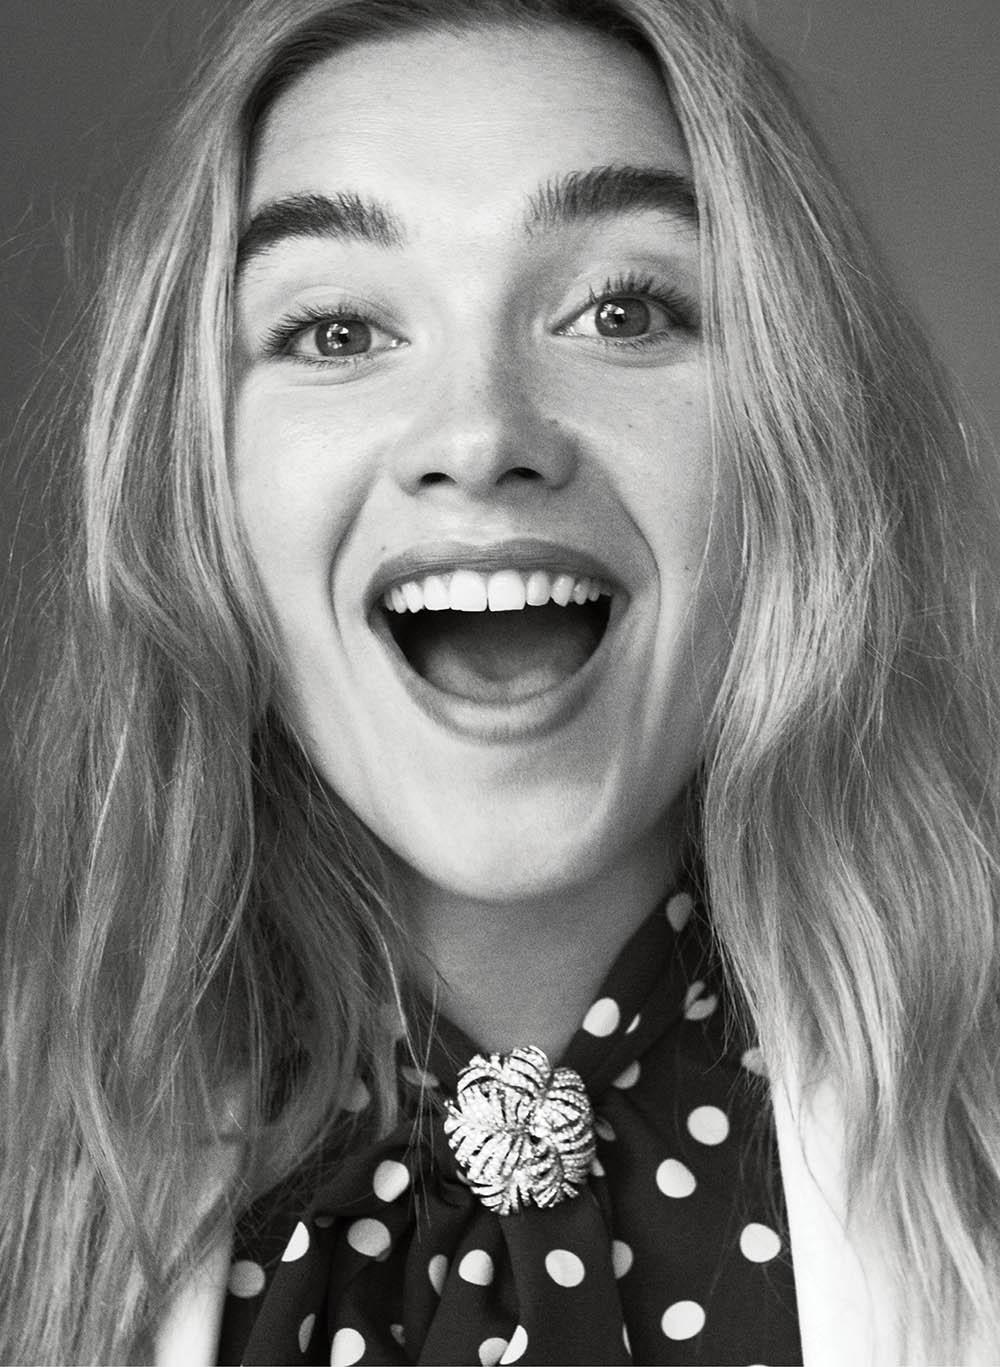 Florence Pugh covers Vogue US February 2020 by Daniel Jackson